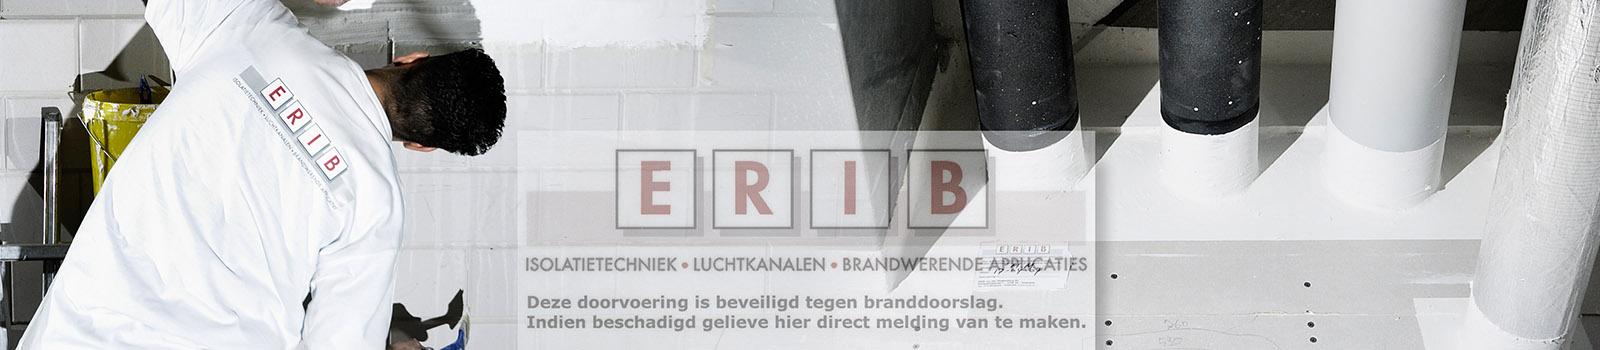 brandwerend-banner-small